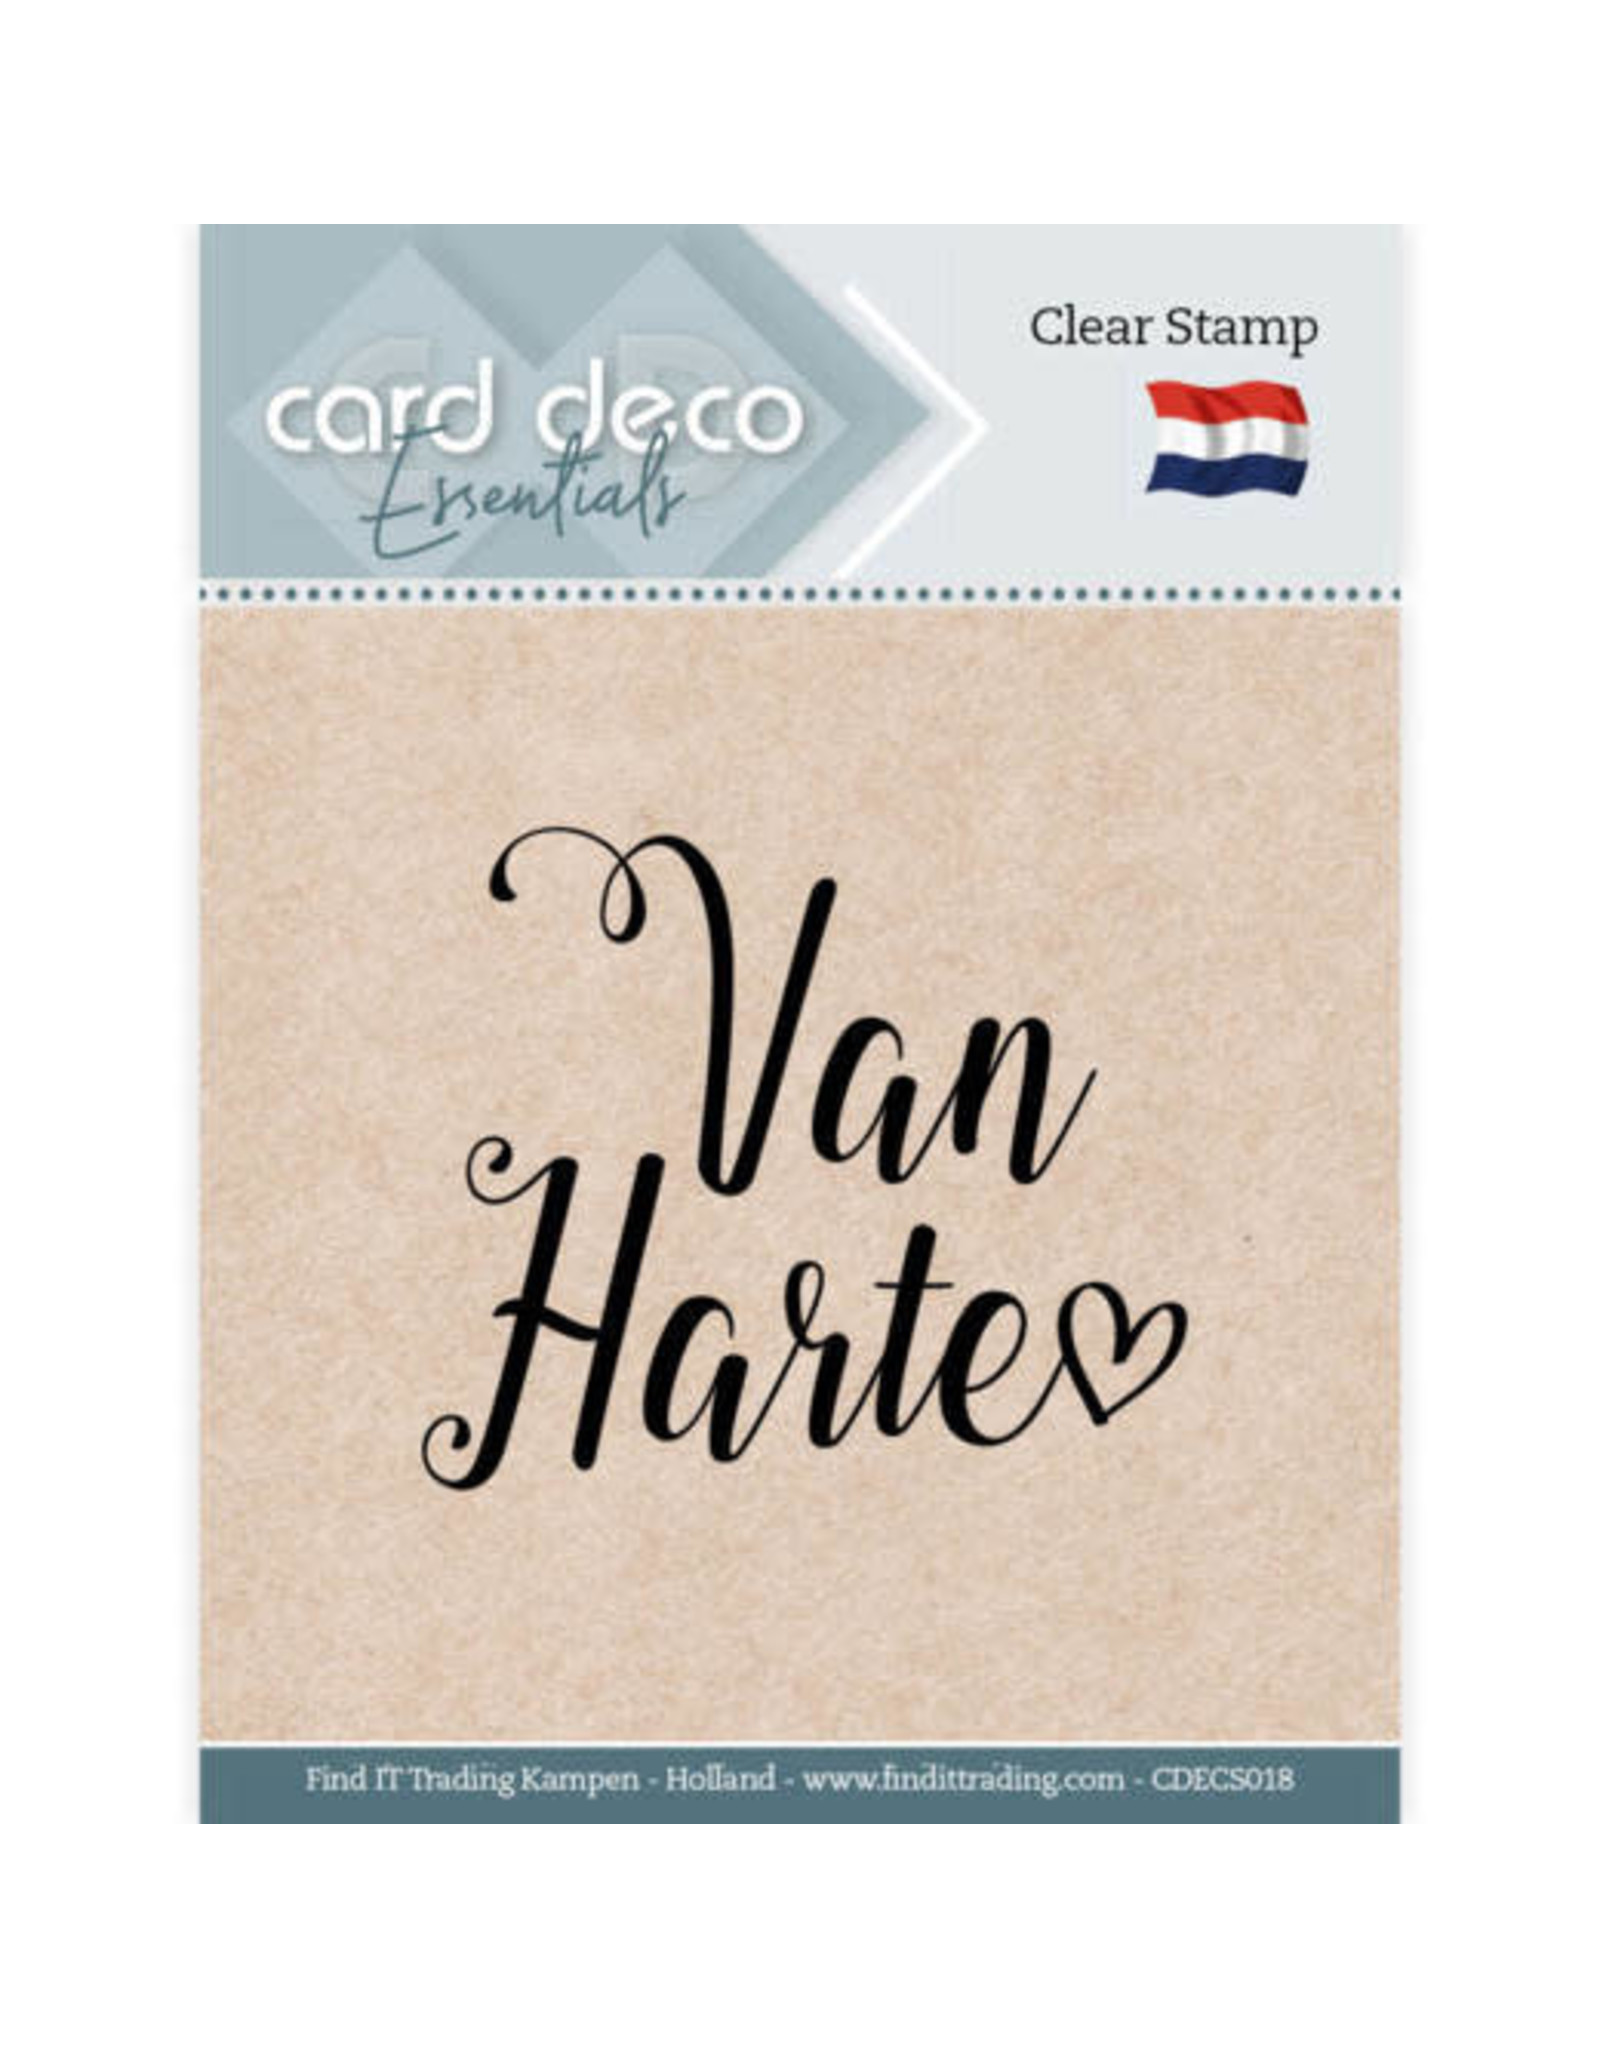 Card Deco Card Deco Essentials - Clear Stamps - Van Harte